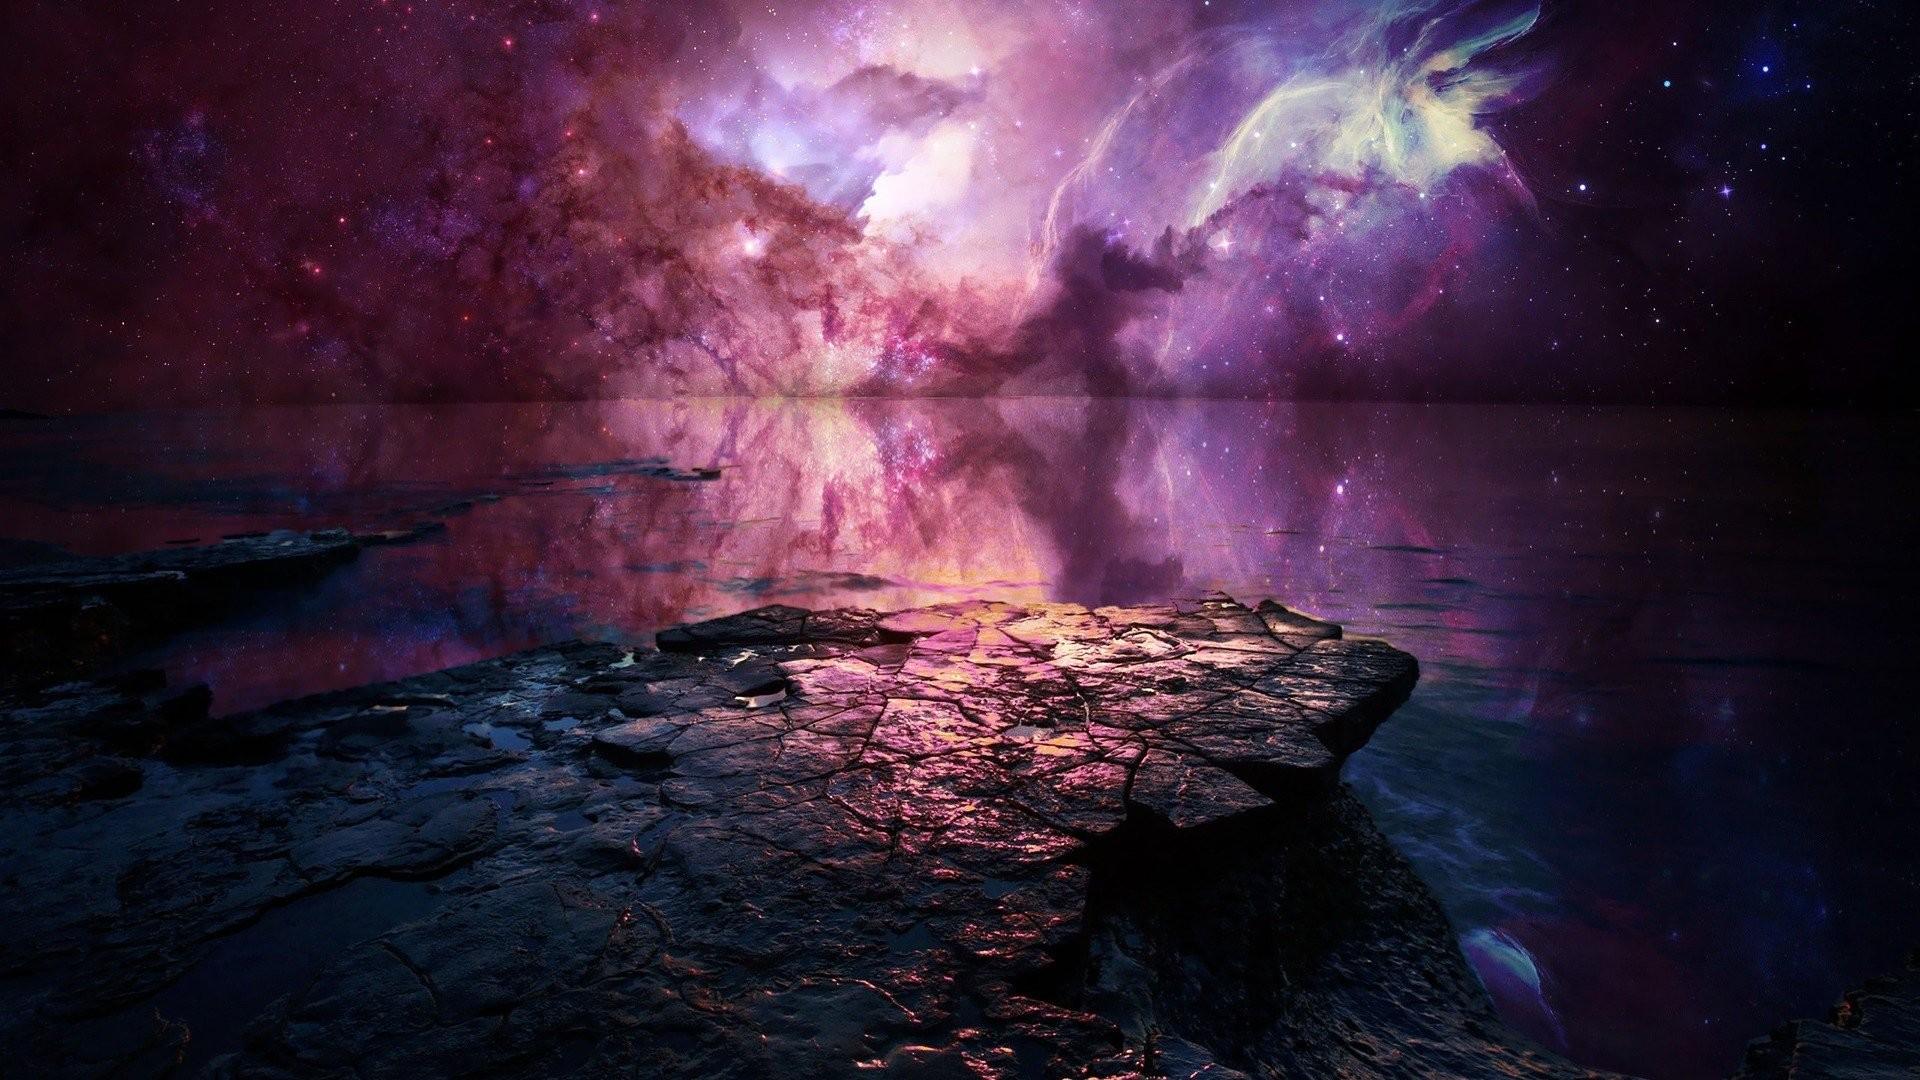 Artwork Fantasy Art Concept Science Fiction Planets Nebulae Skies Stars